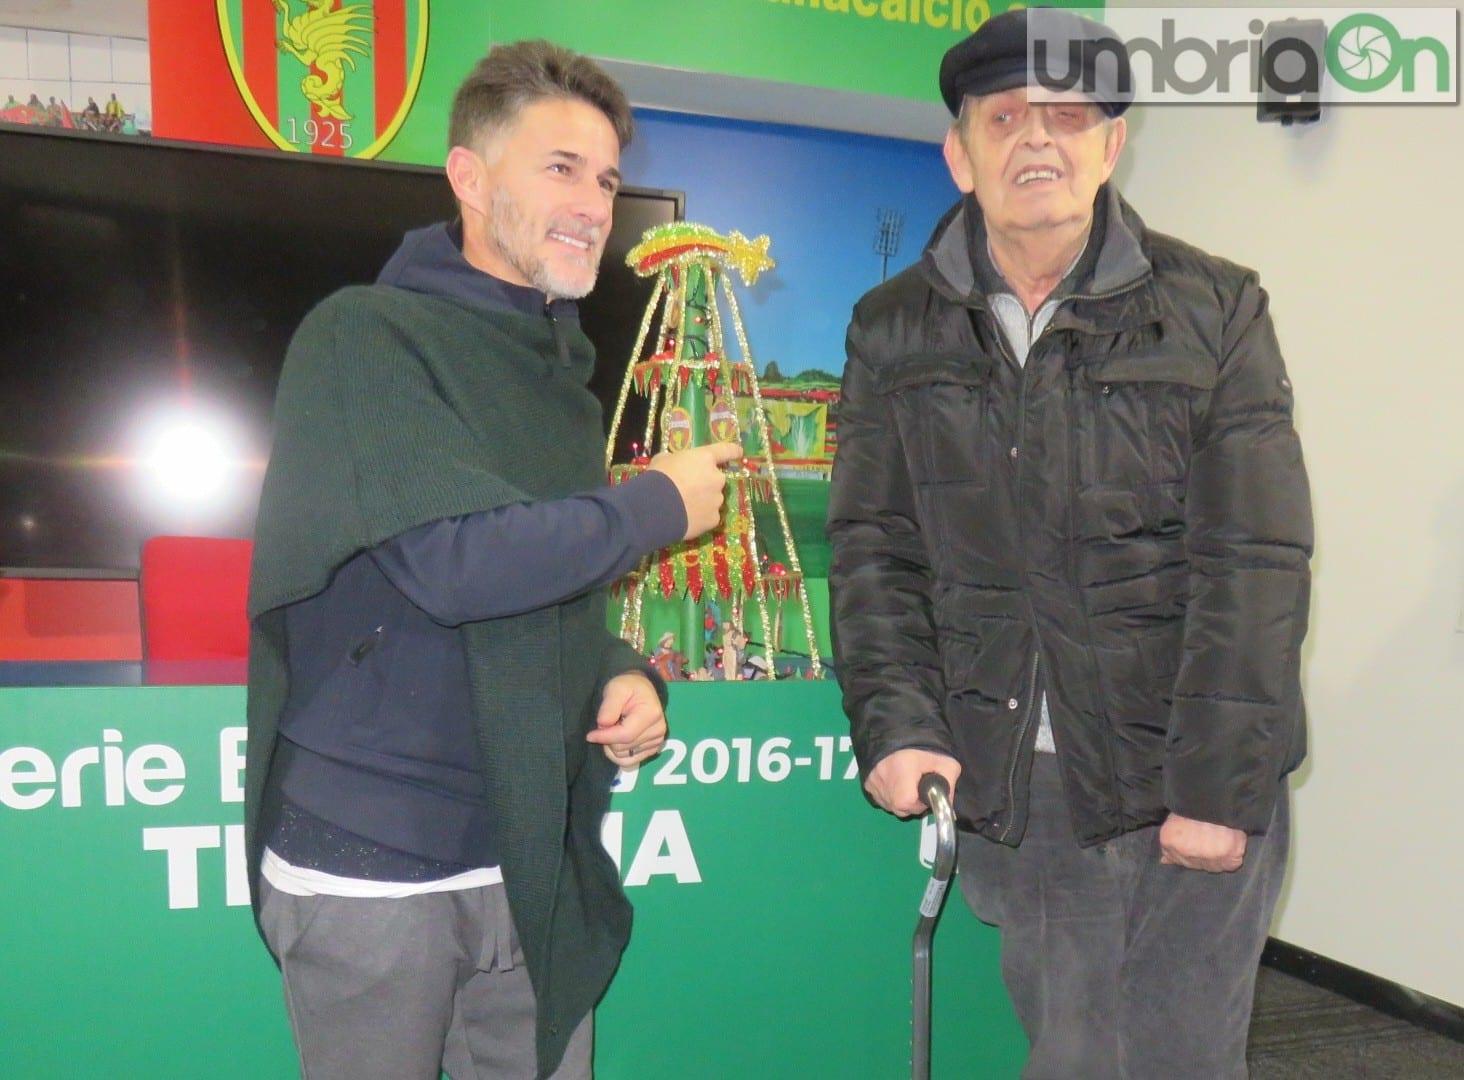 Ternana-Vicenza 1-2, Benito Carbone :